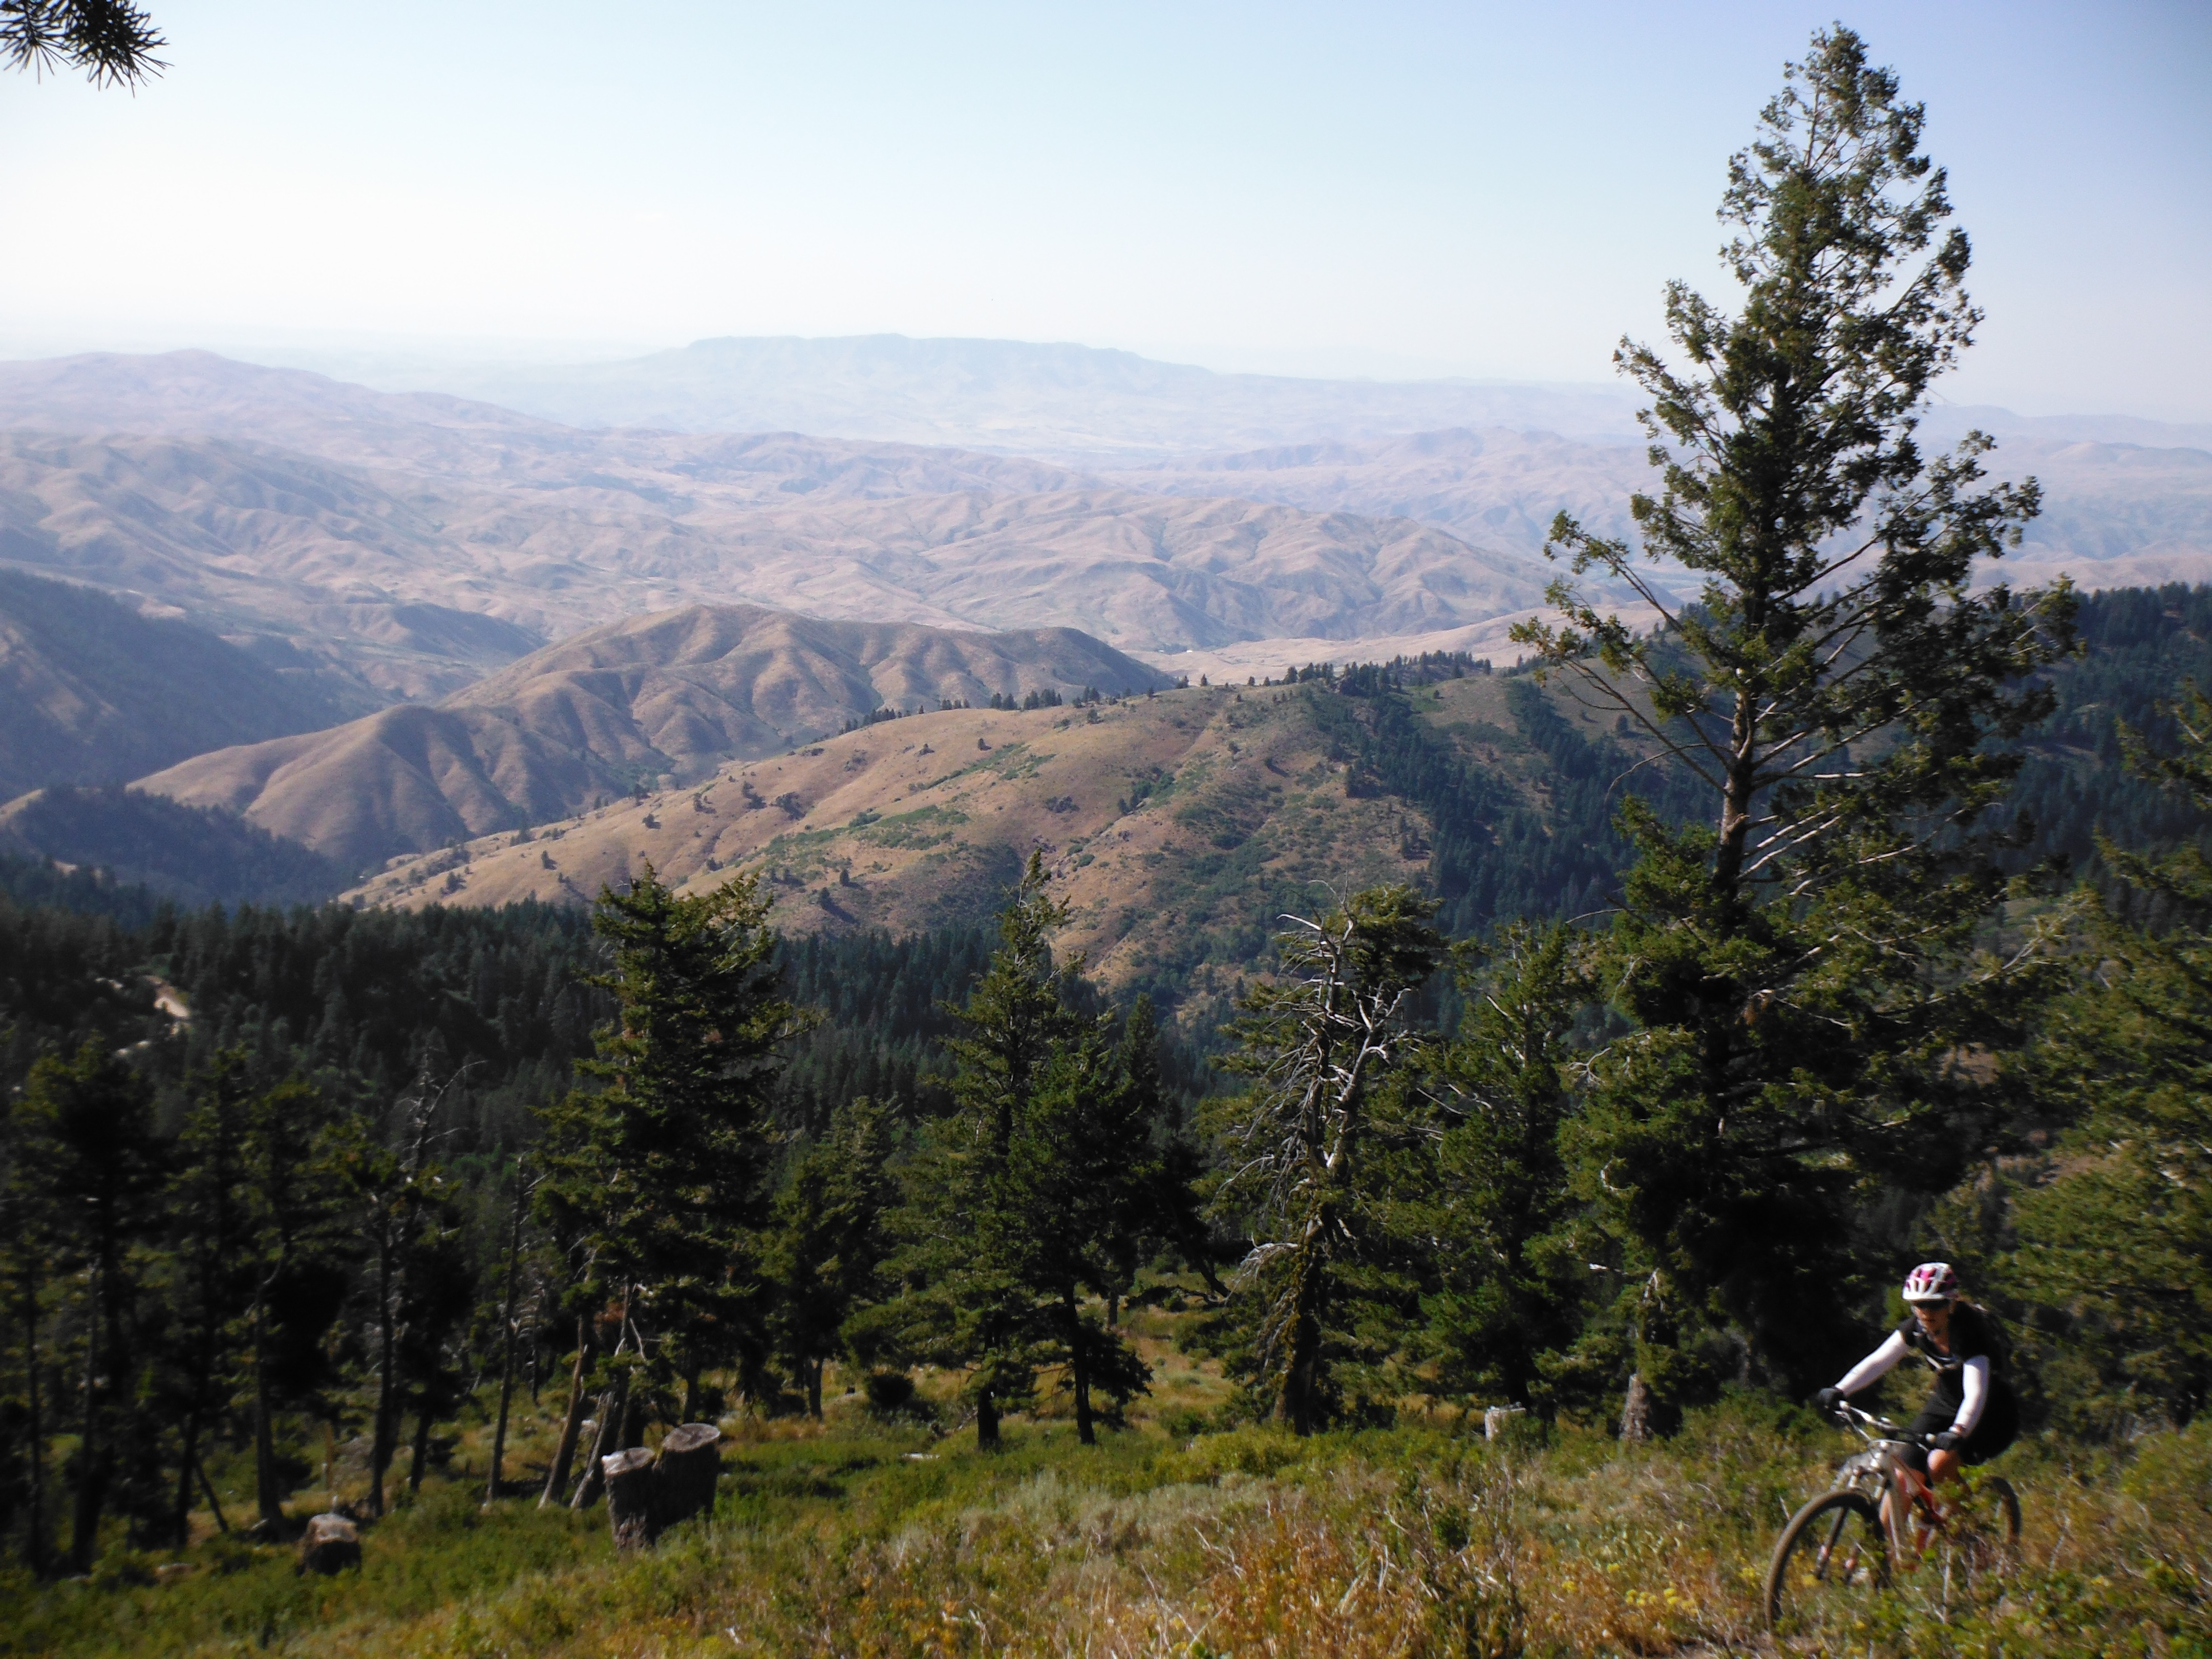 Shafer Butte Trails, Boise. Photo by: jkldouglas